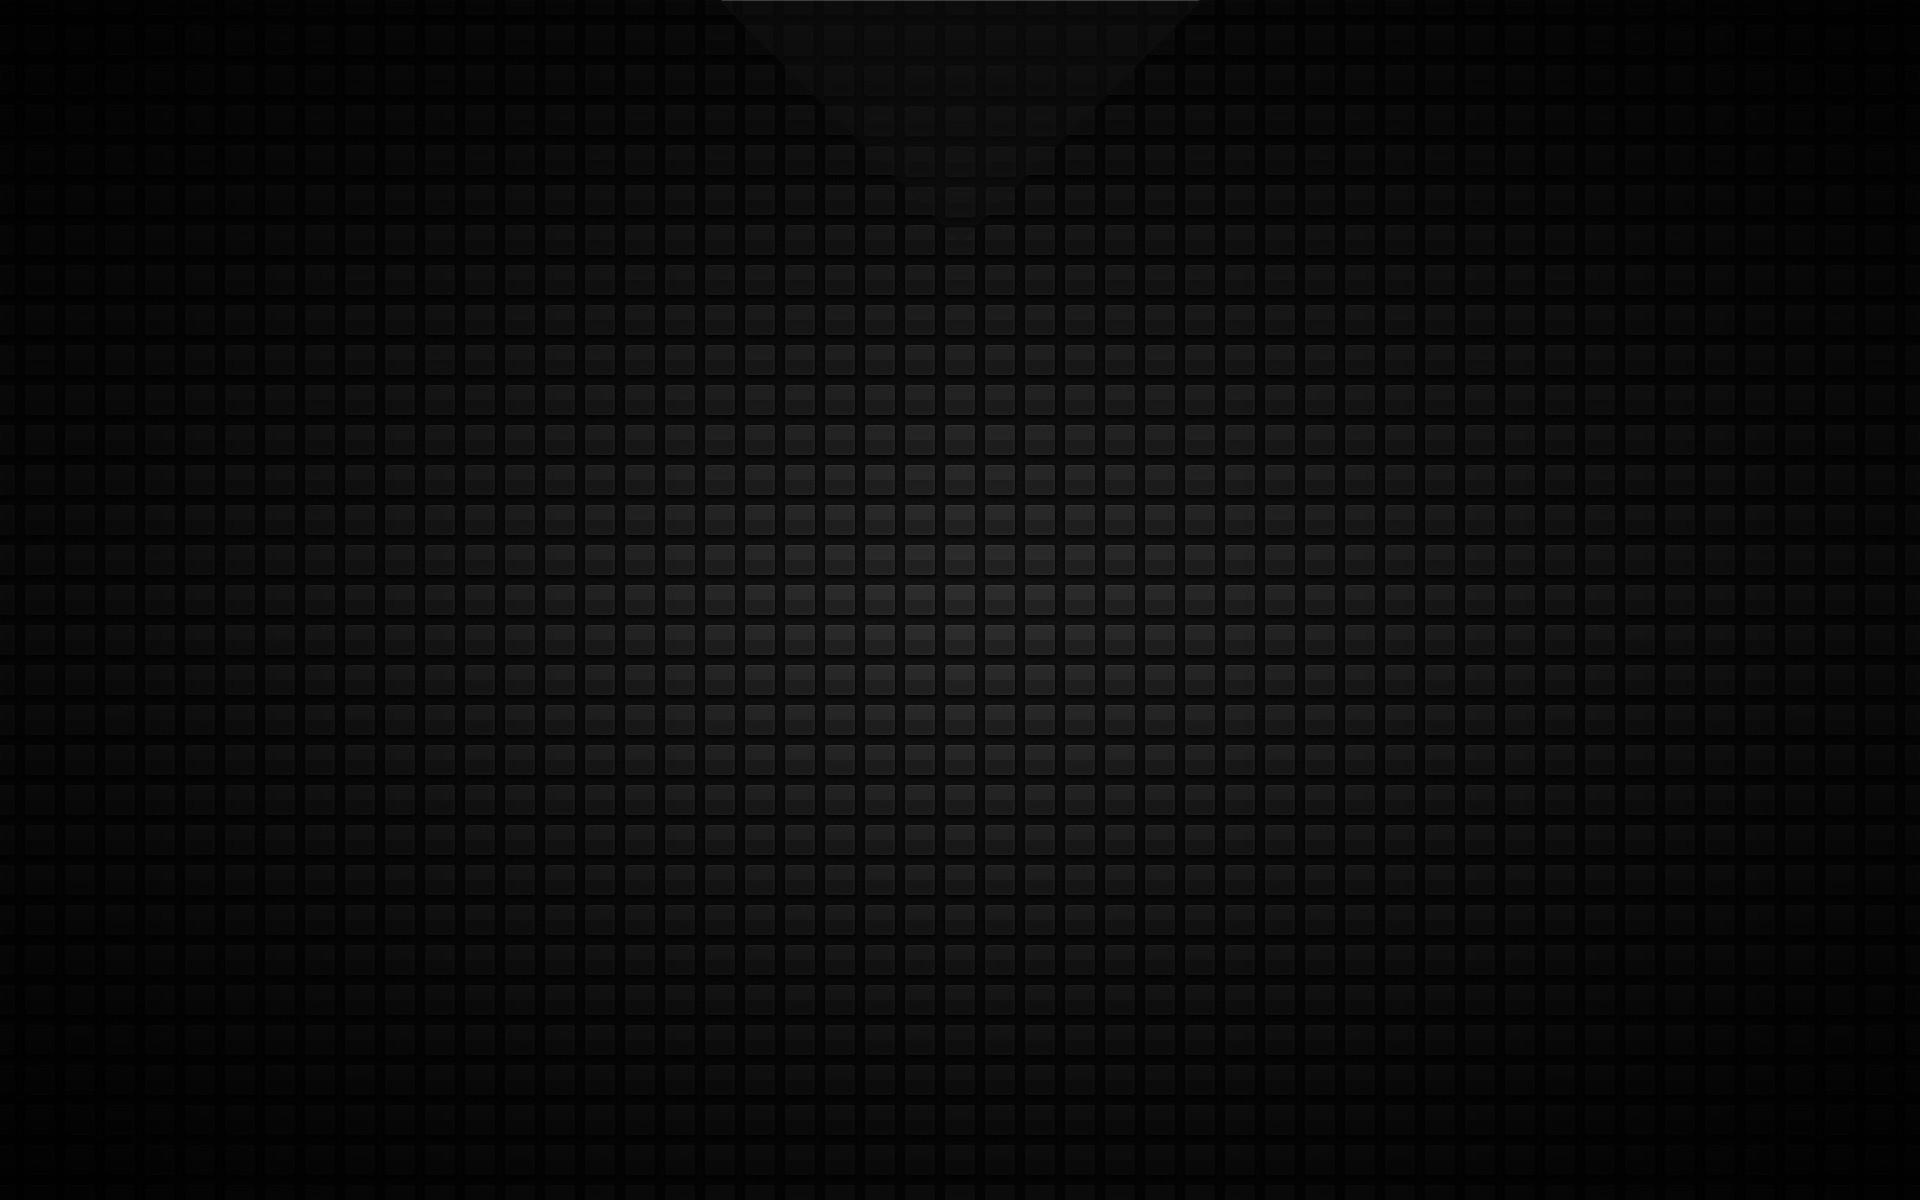 Free Black Background Wallpaper – WallpaperSafari